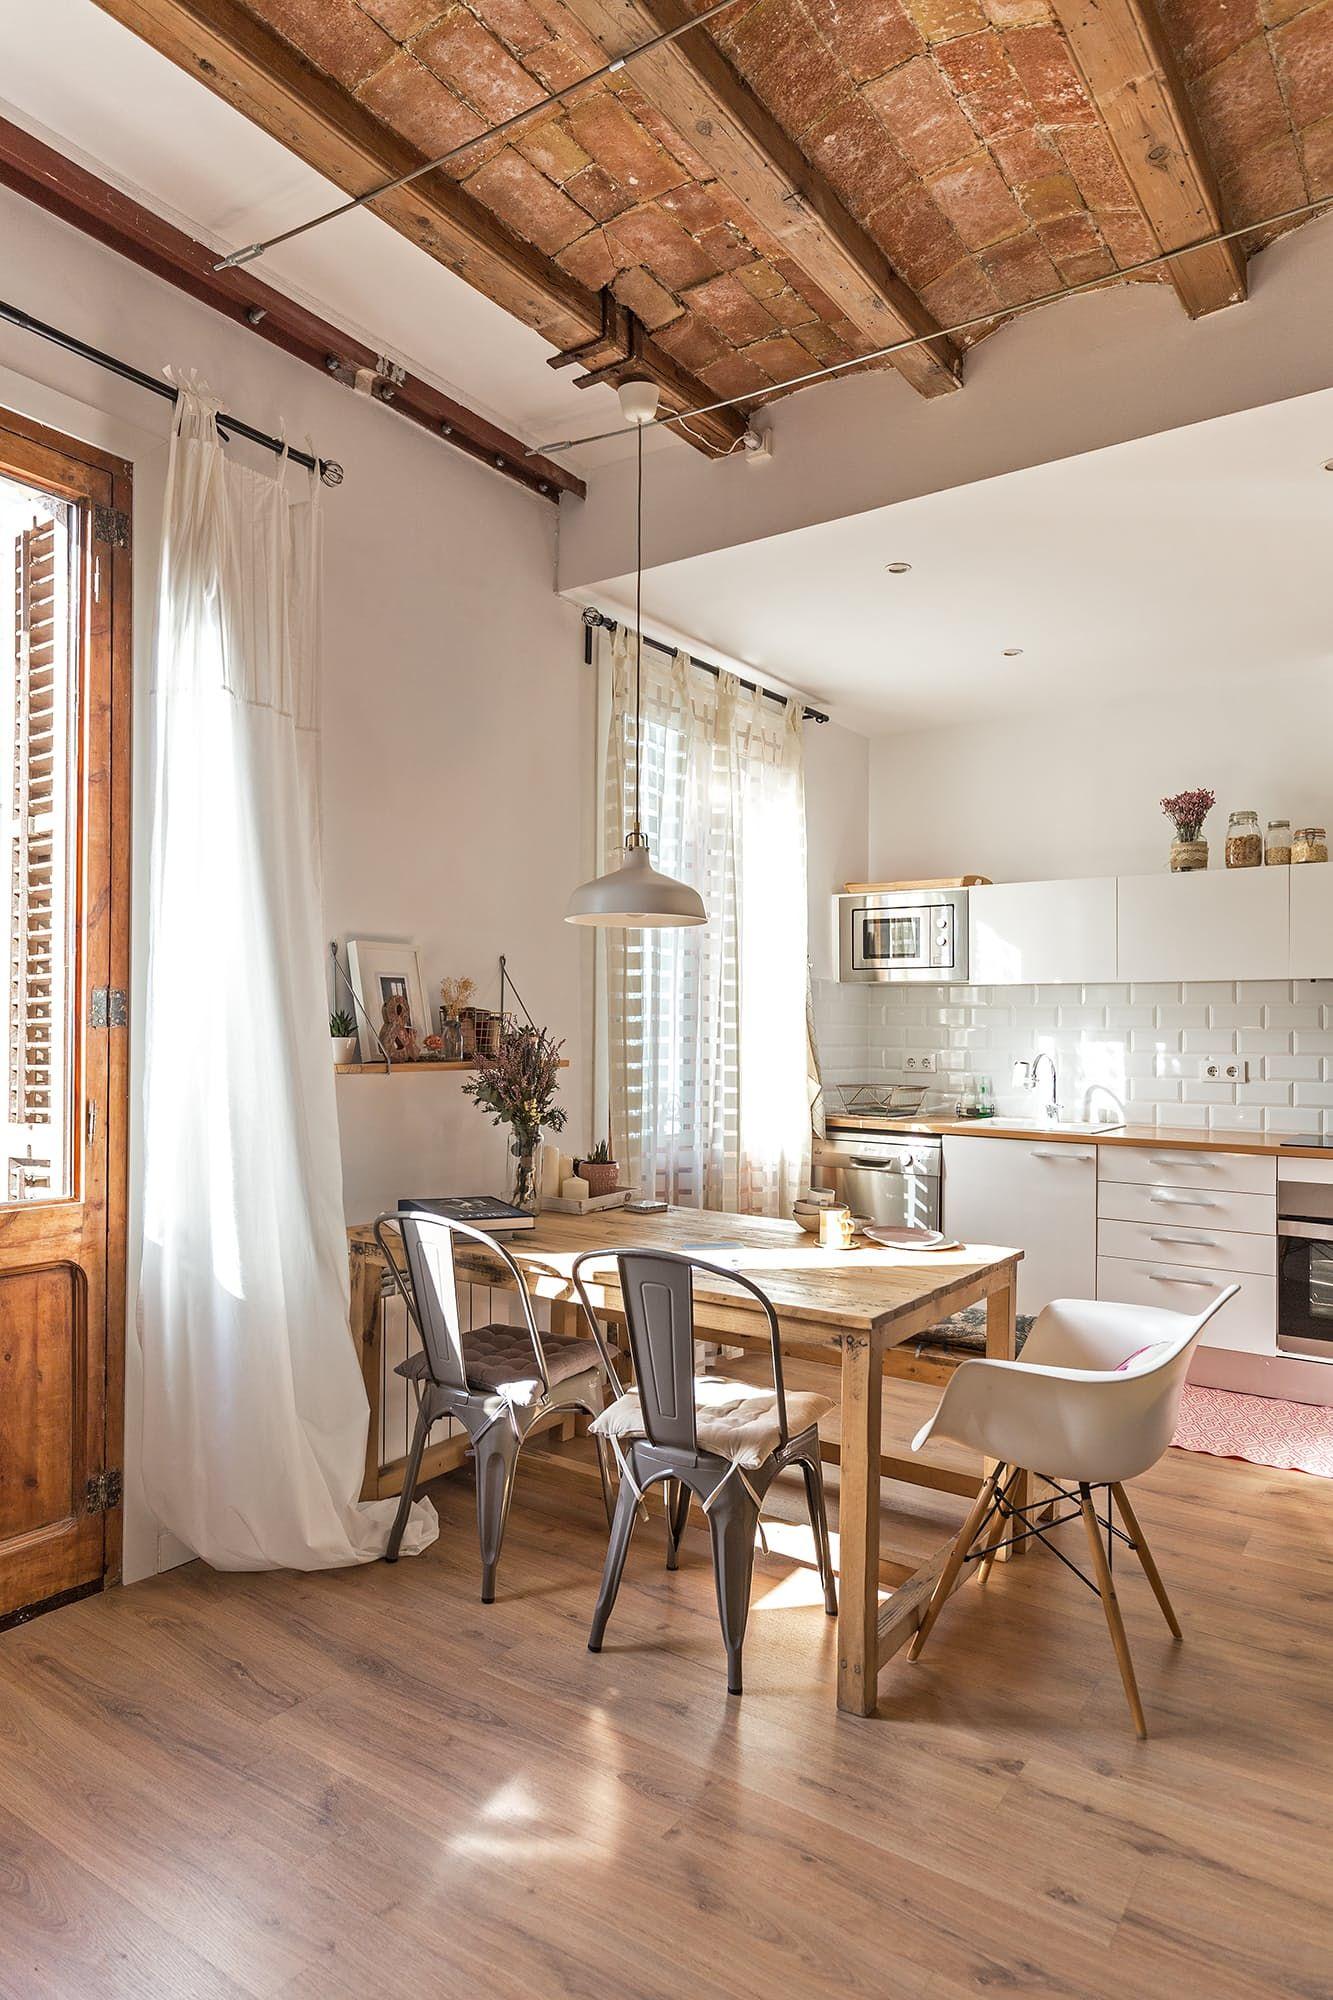 Muebles De Casa Barcelona - House Tour A Sunny Soulful Renovated Barcelona Apartment Hacer [mjhdah]http://derdekor.com/wp-content/uploads/2017/12/casa-de-muebles-en-barcelona-28224-restaurar-muebles-el-toque-de-antac2b1o-para-tu-casa-rural-of-casa-de-muebles-en-barcelona.jpg